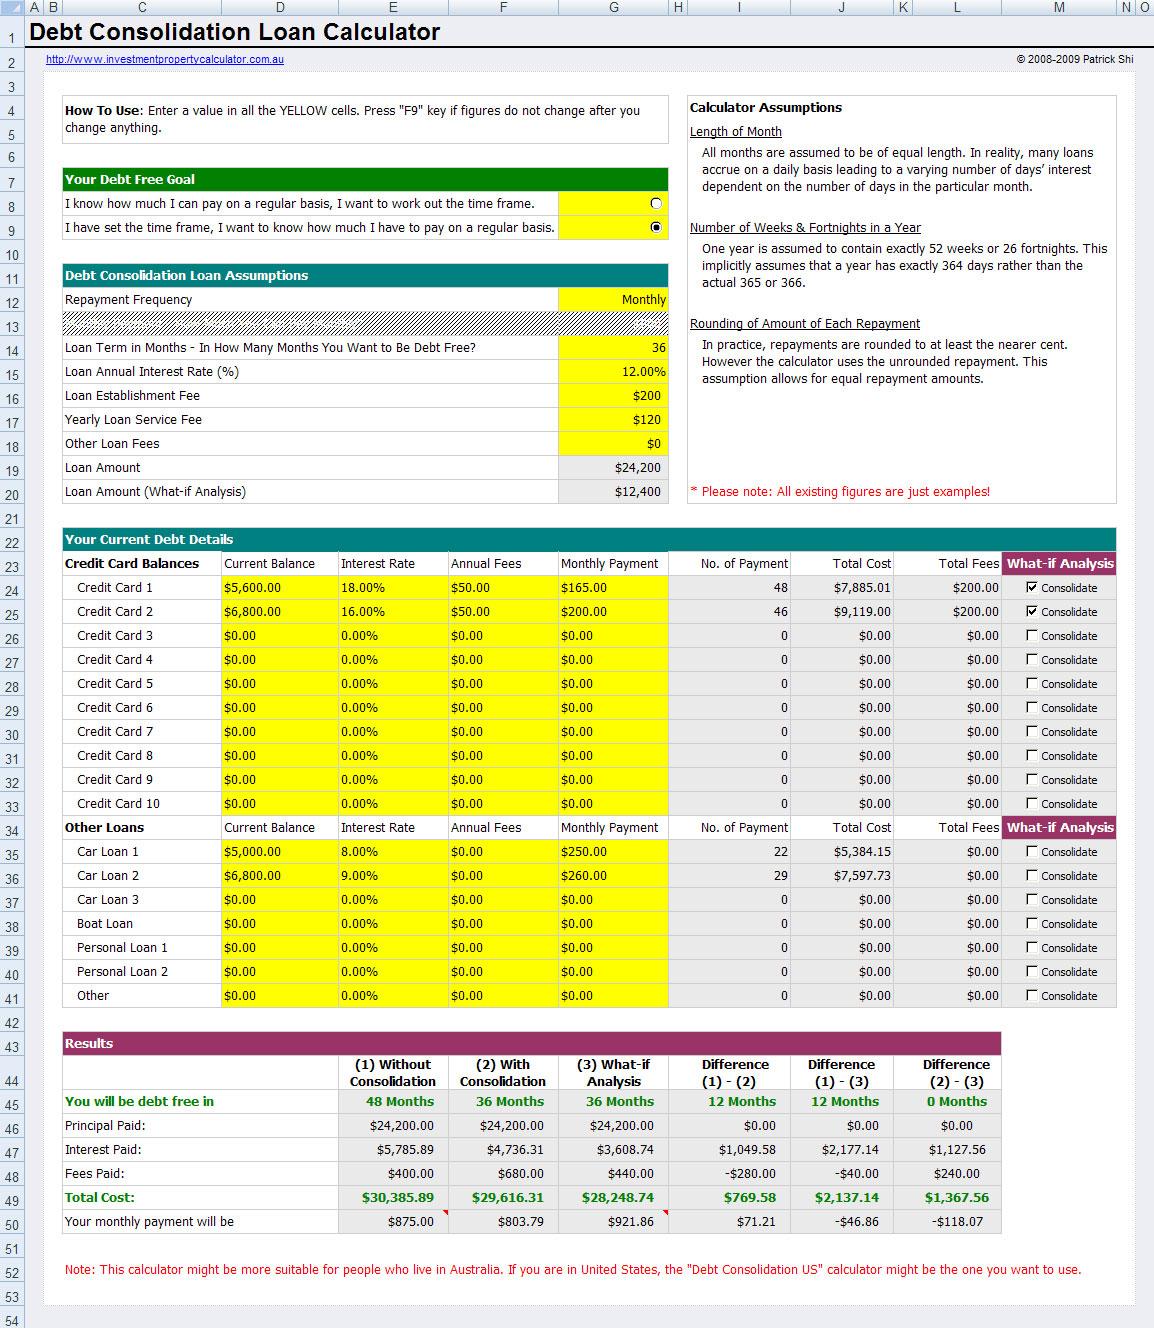 Credit Card Repayment Calculator Spreadsheet For Loan